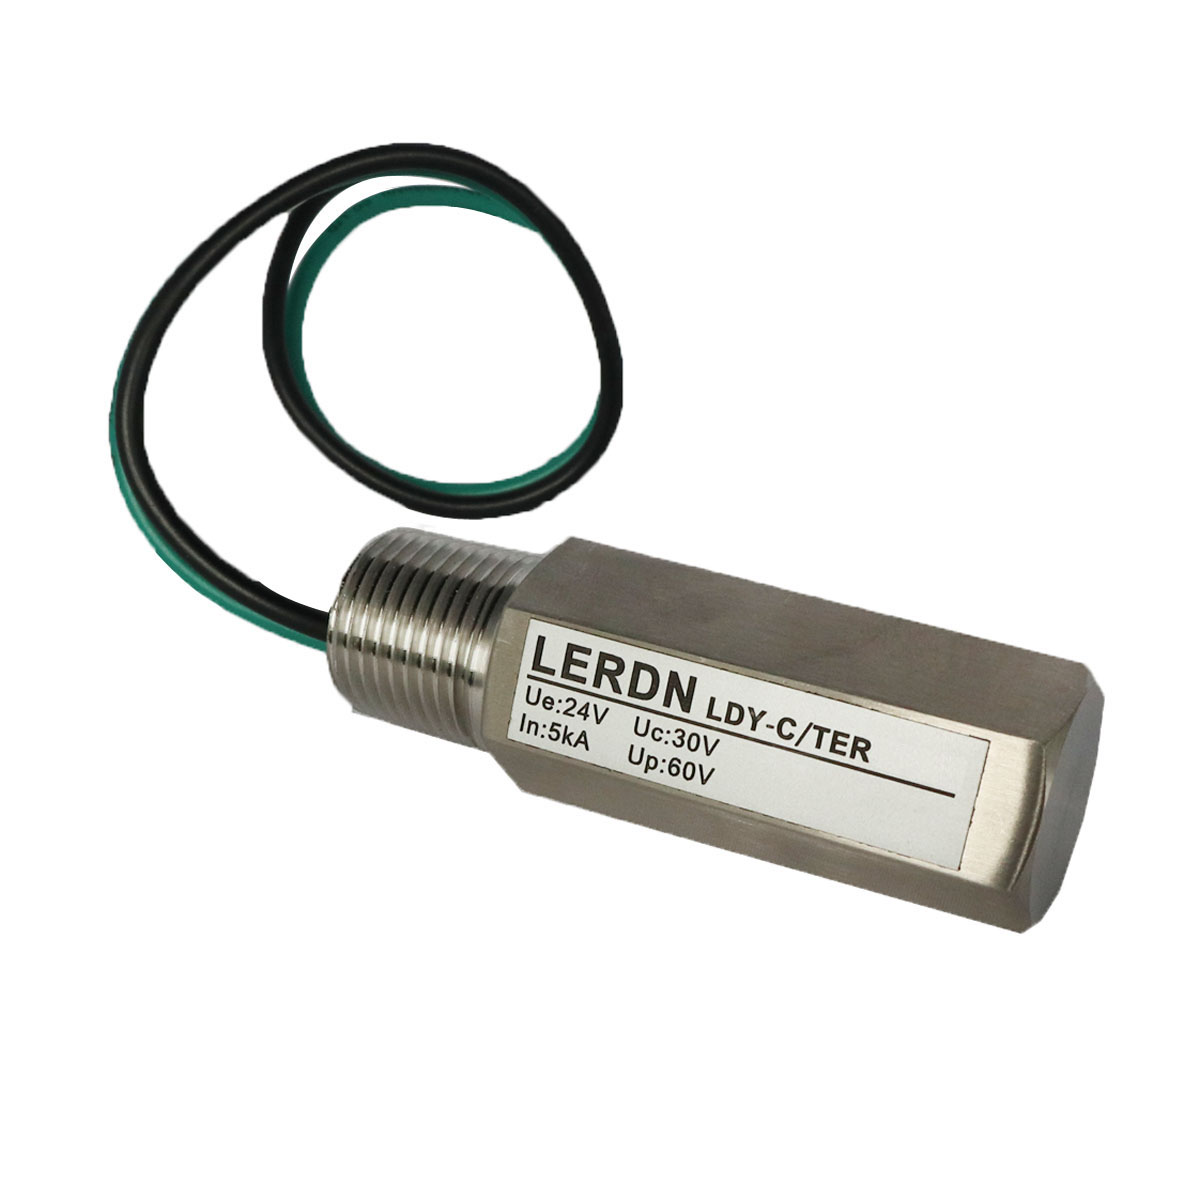 For Fiber Cabling